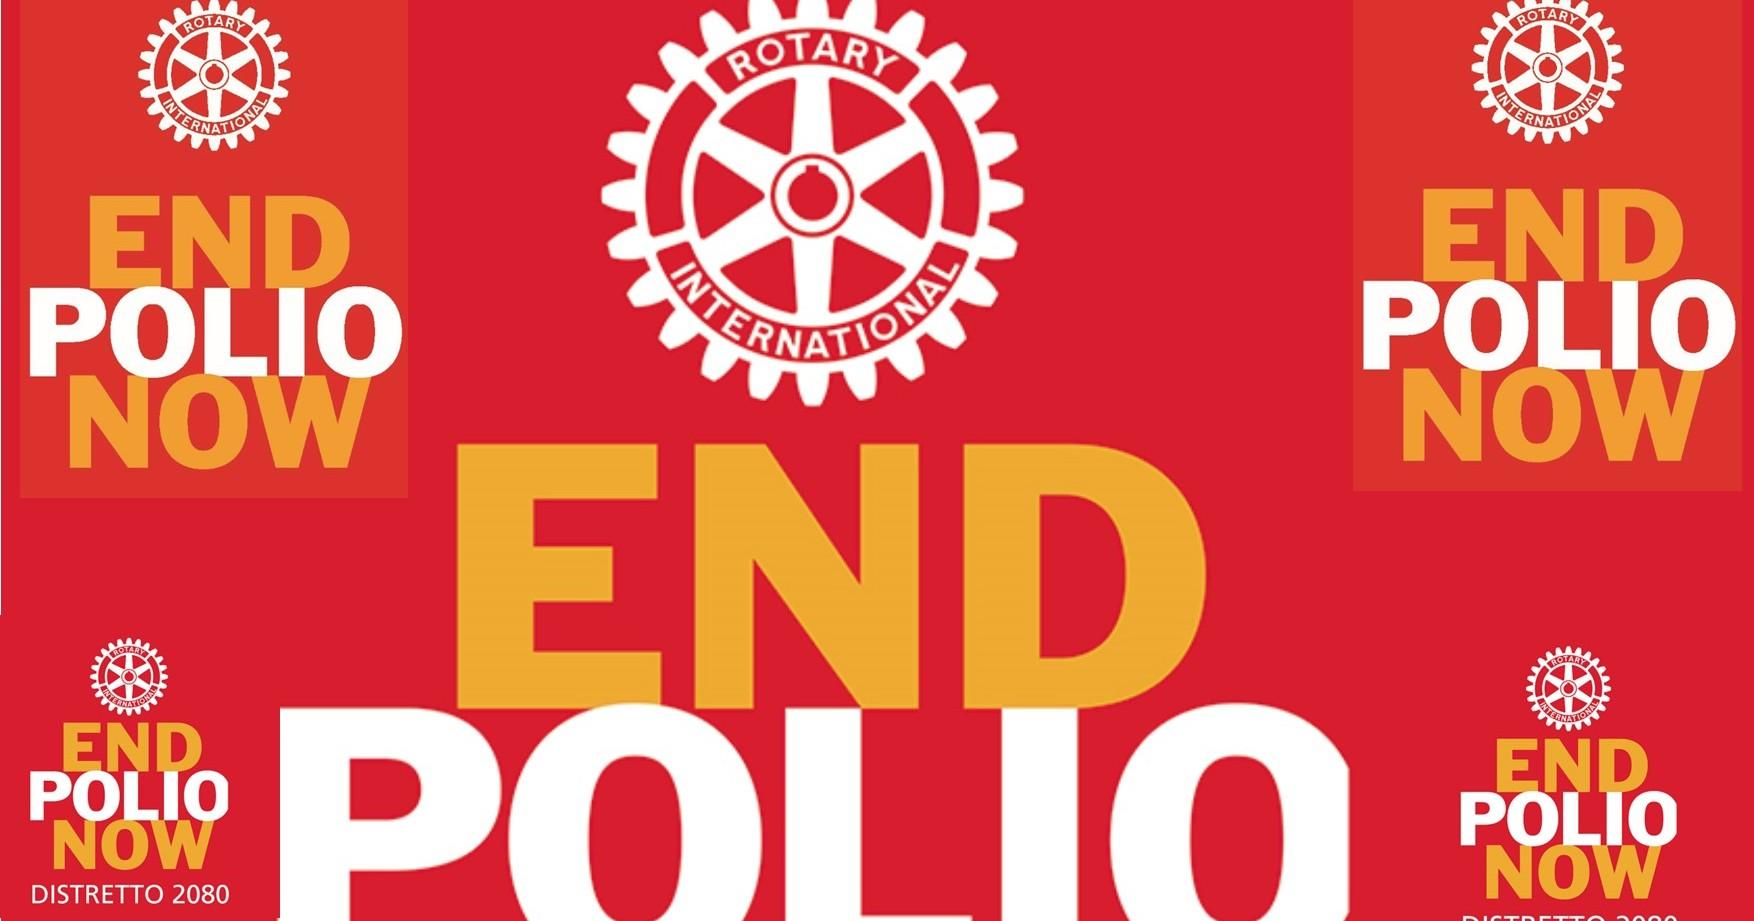 RunForPolio 2021 - Rotary Distretto 2080-Rotary International Distretto 2080